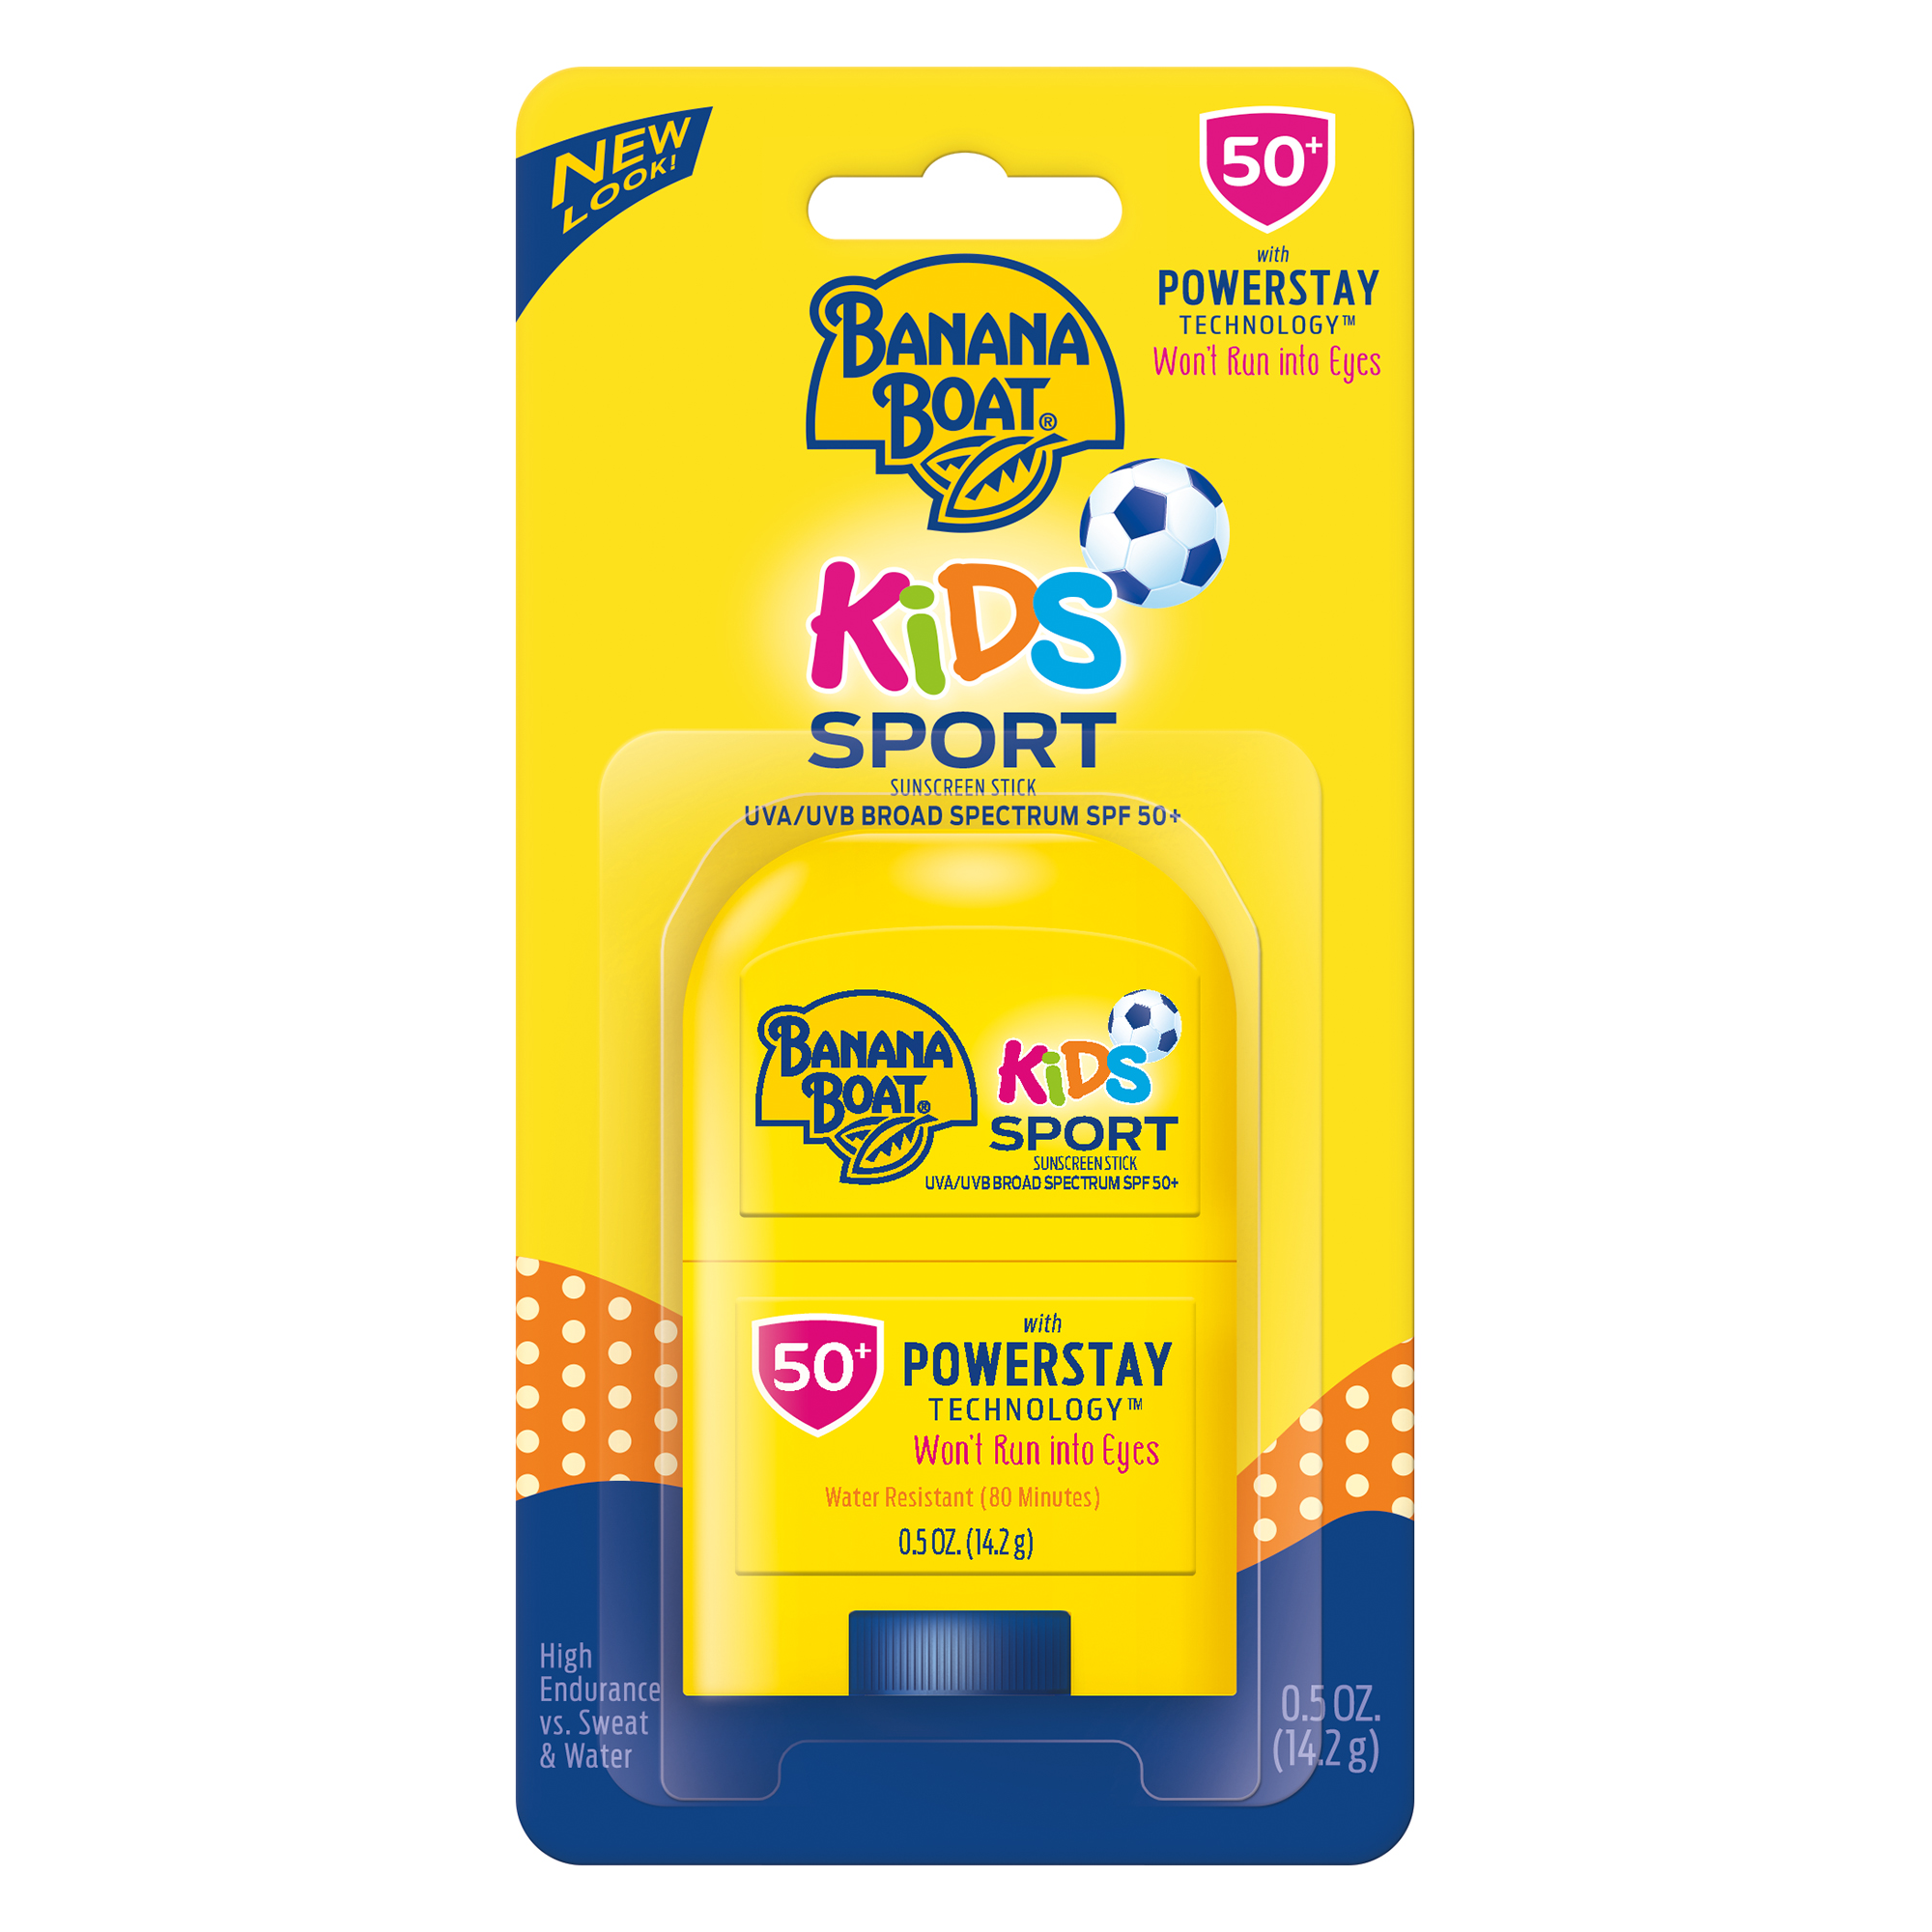 (2 pack) Banana Boat Kids Sport Sunscreen Stick SPF 50+, 0.5 oz